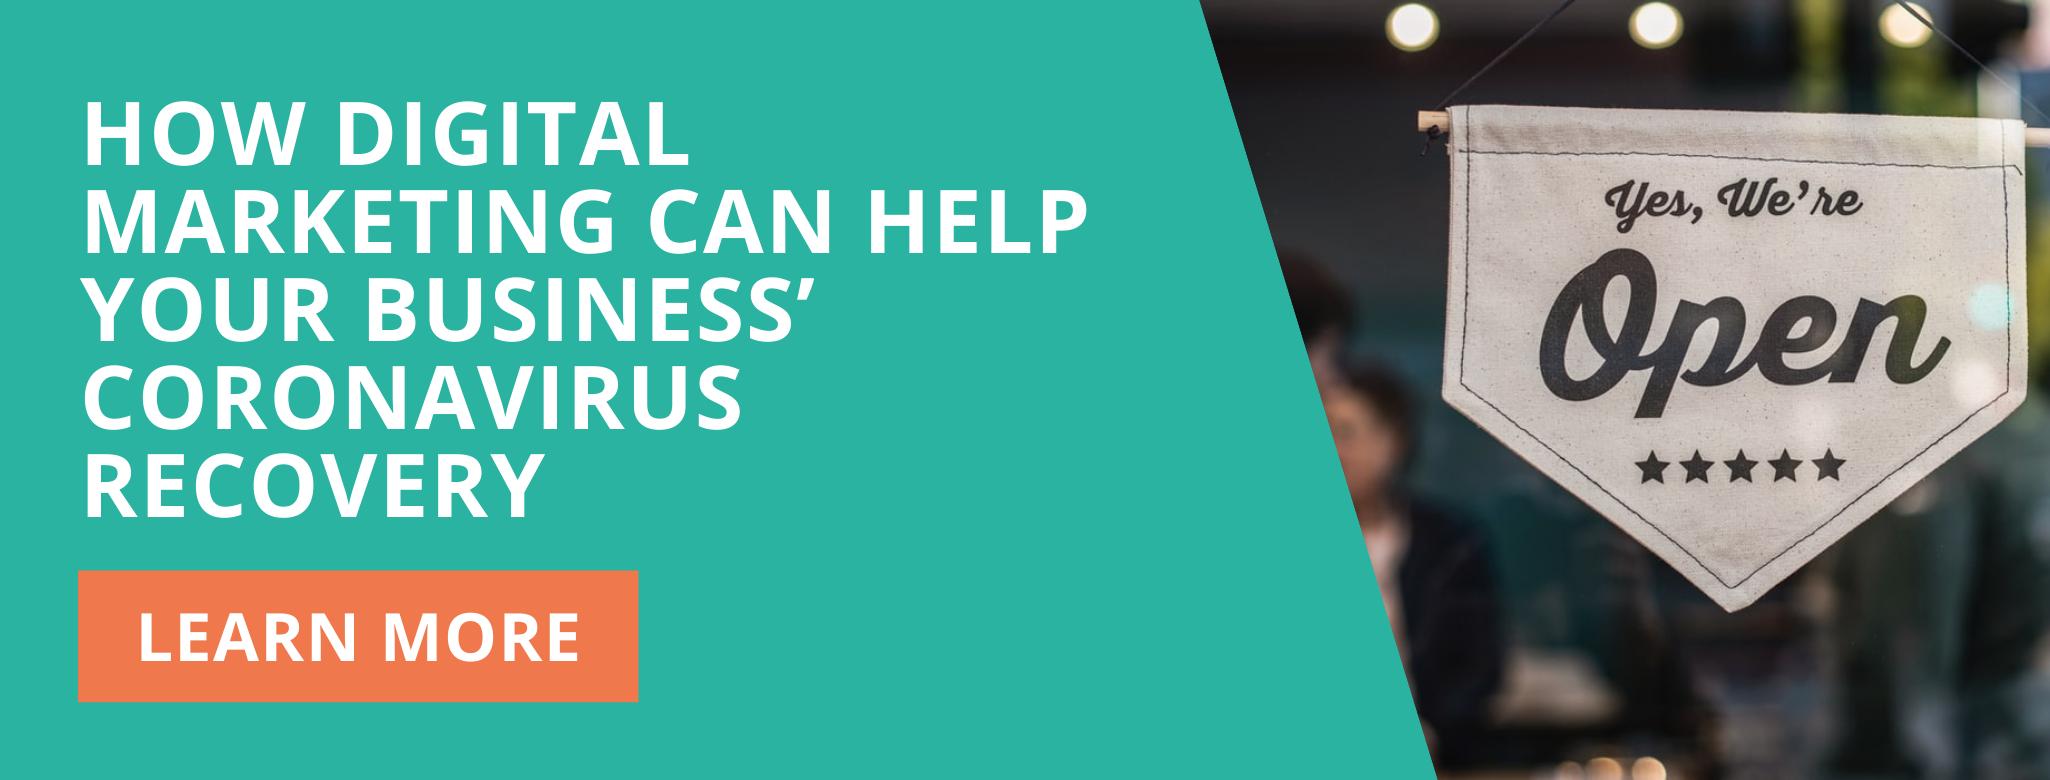 How digital marketing can help business coronavirus recovery Ducard blog